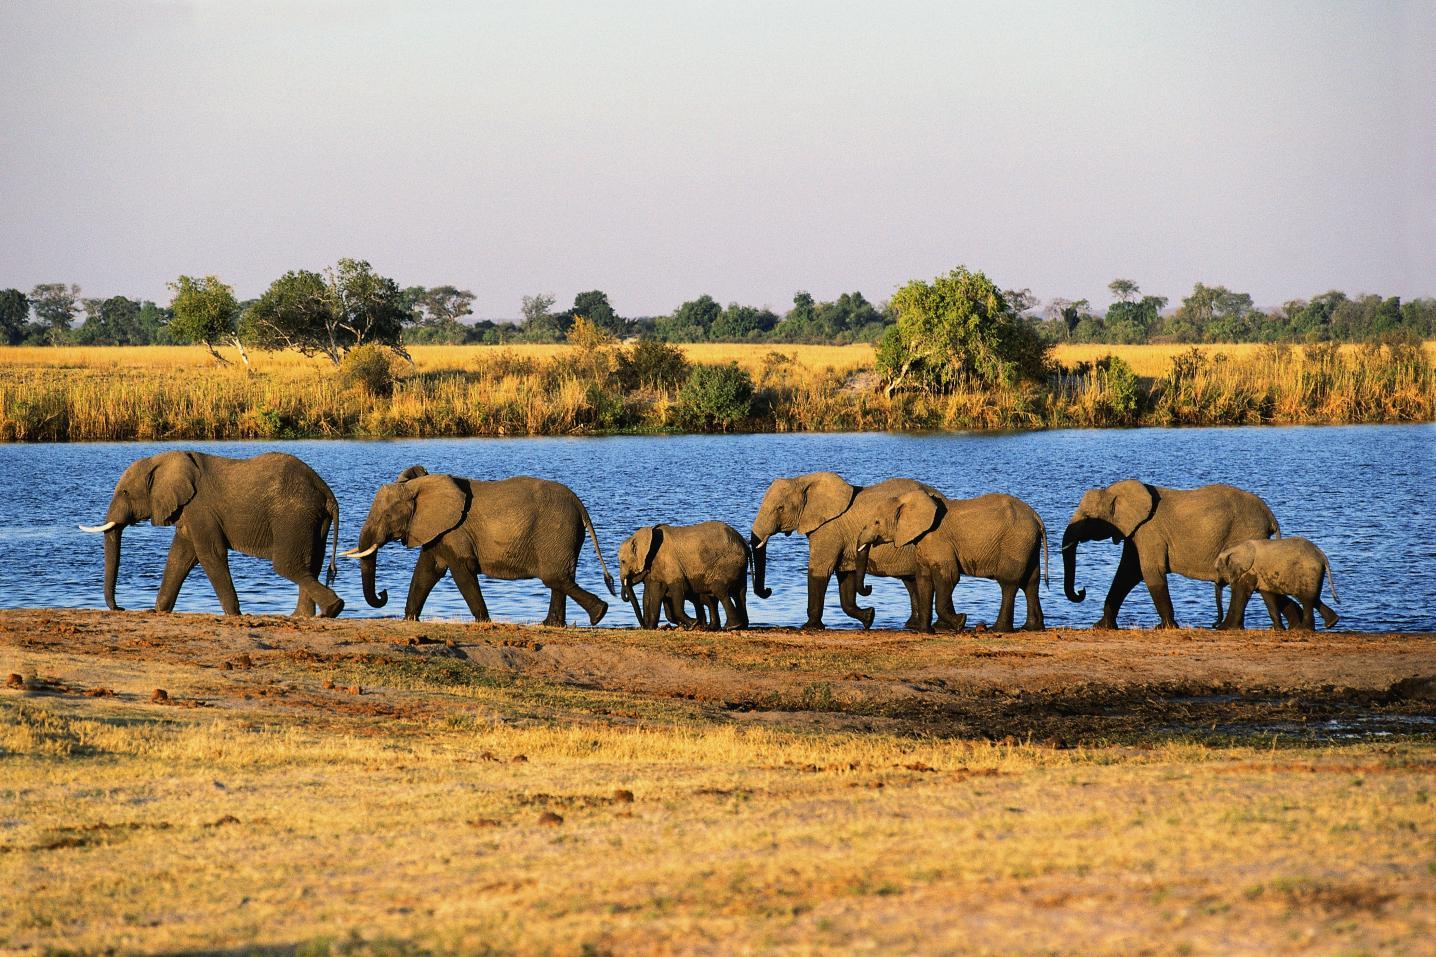 Comb Ducks on Lake, Savute Chobe National Park, Botswana бесплатно